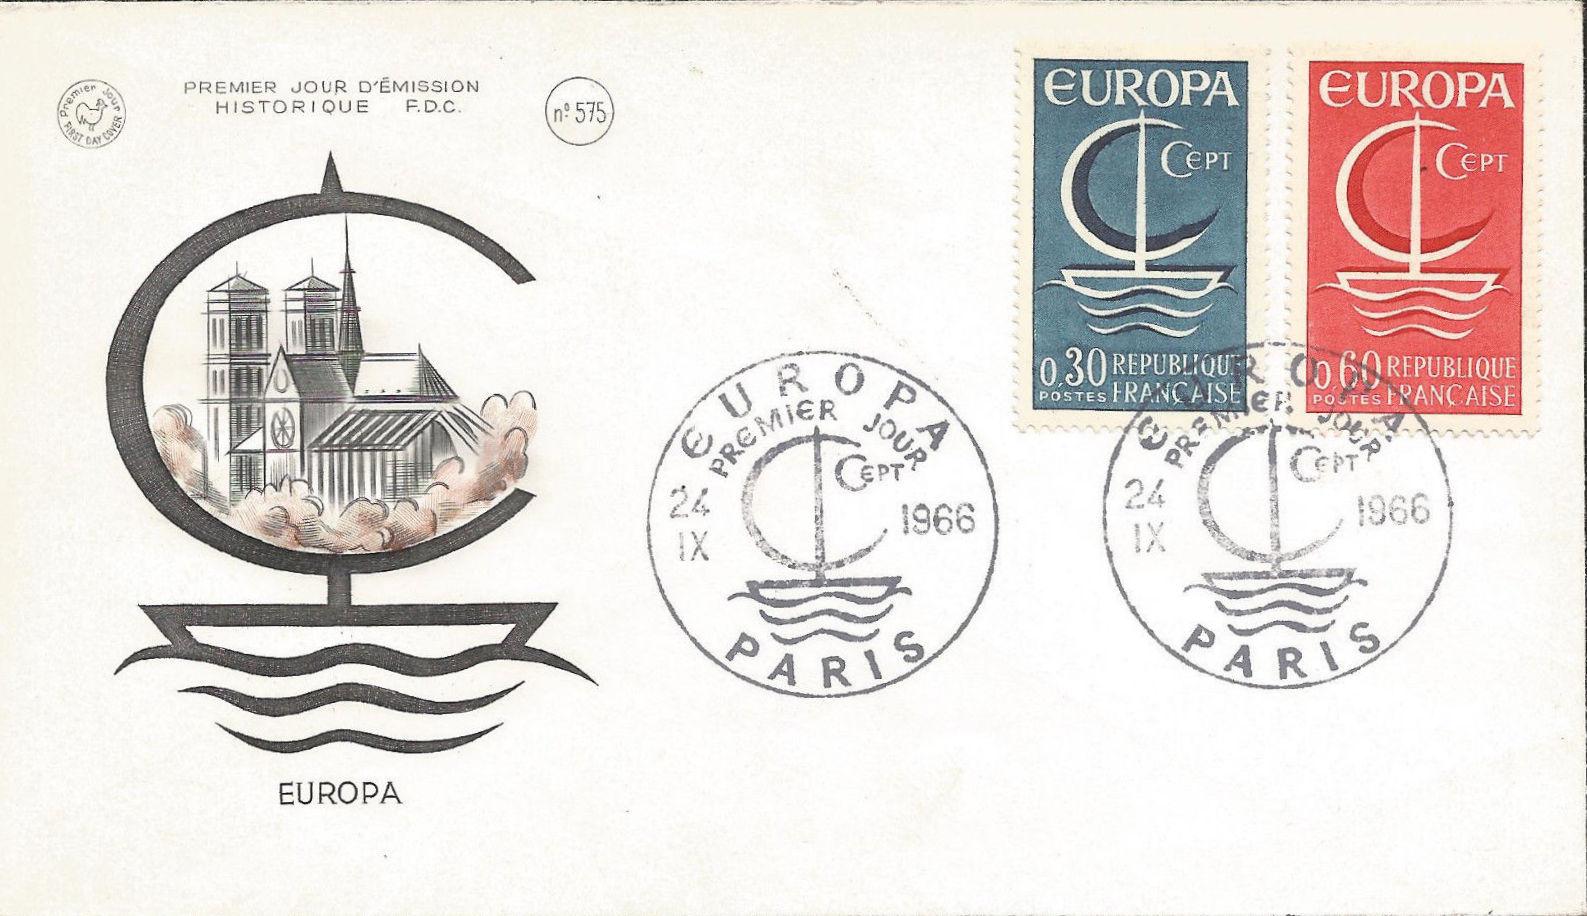 France 1966 EUROPA FDCc.jpg